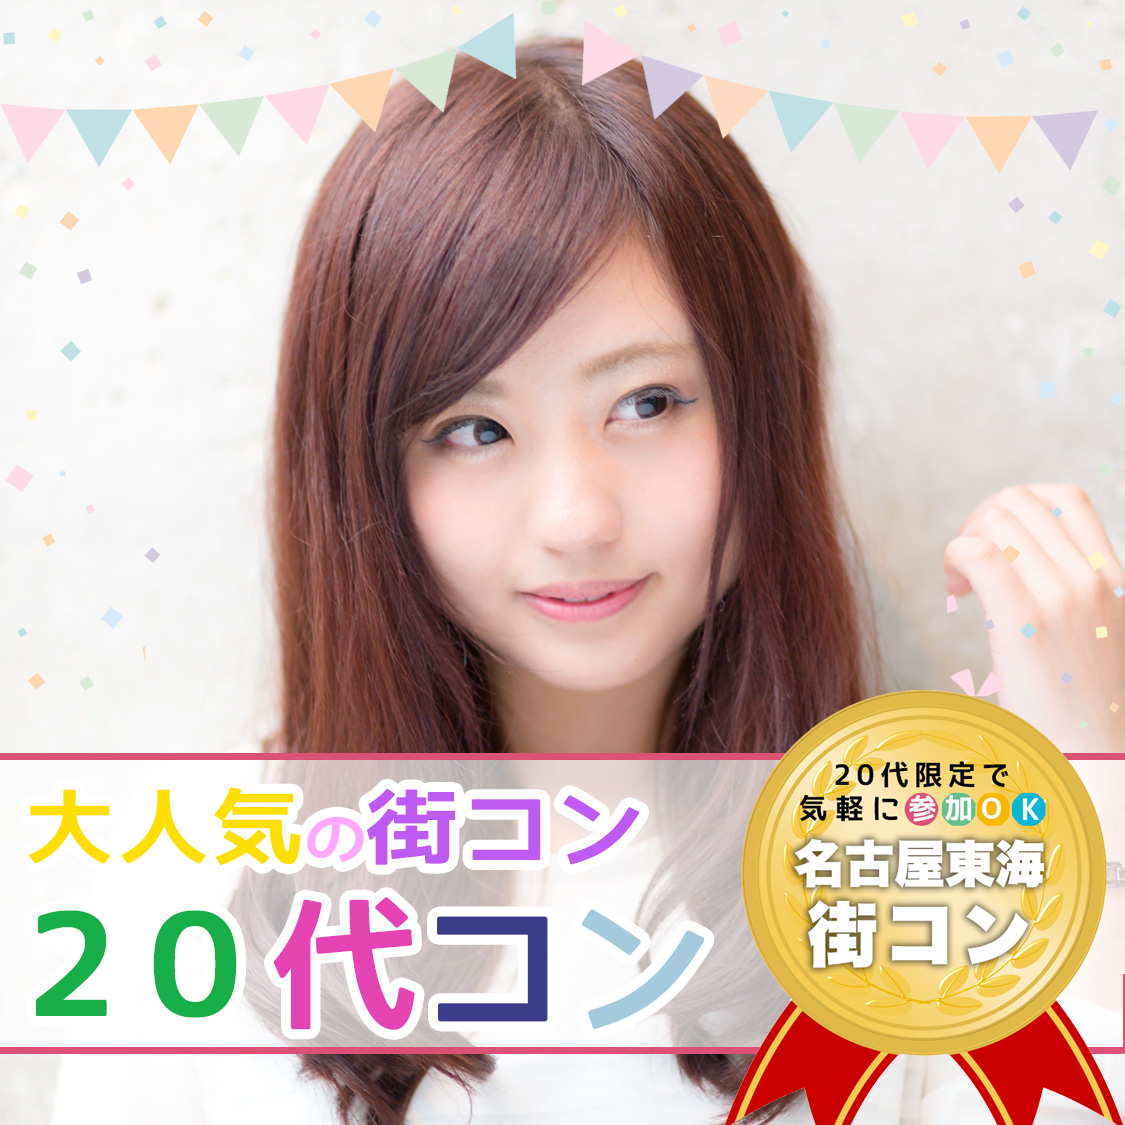 街コン,若い,福服屋 金沢東口駅前店,金沢